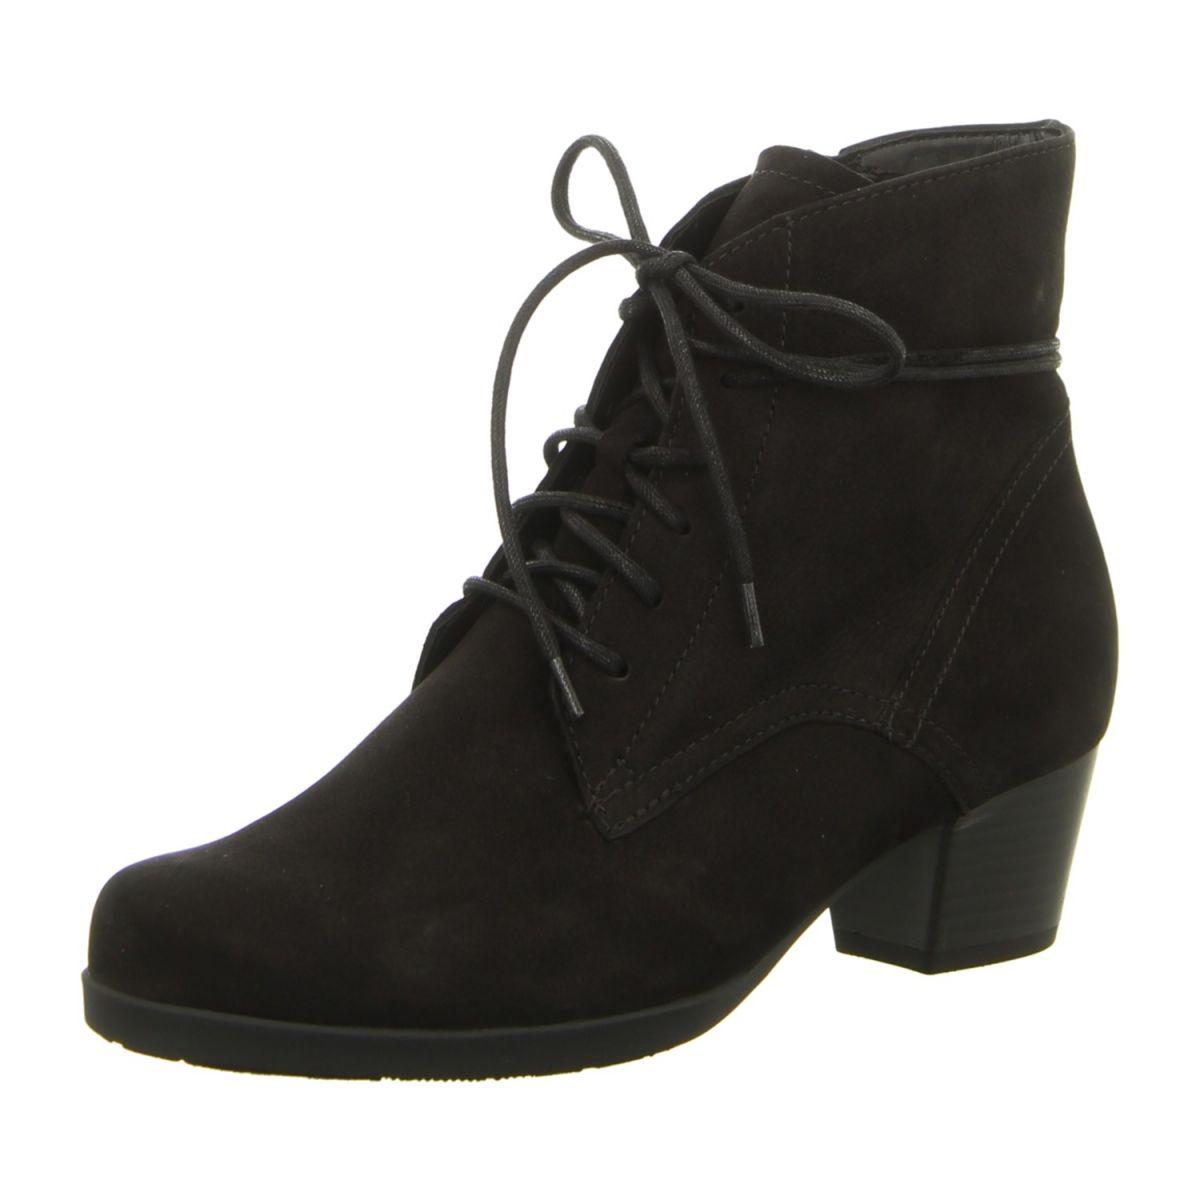 Gabor Damen Basic Stiefel  42.5 EUGrau (19 Anthrazit Kombi)